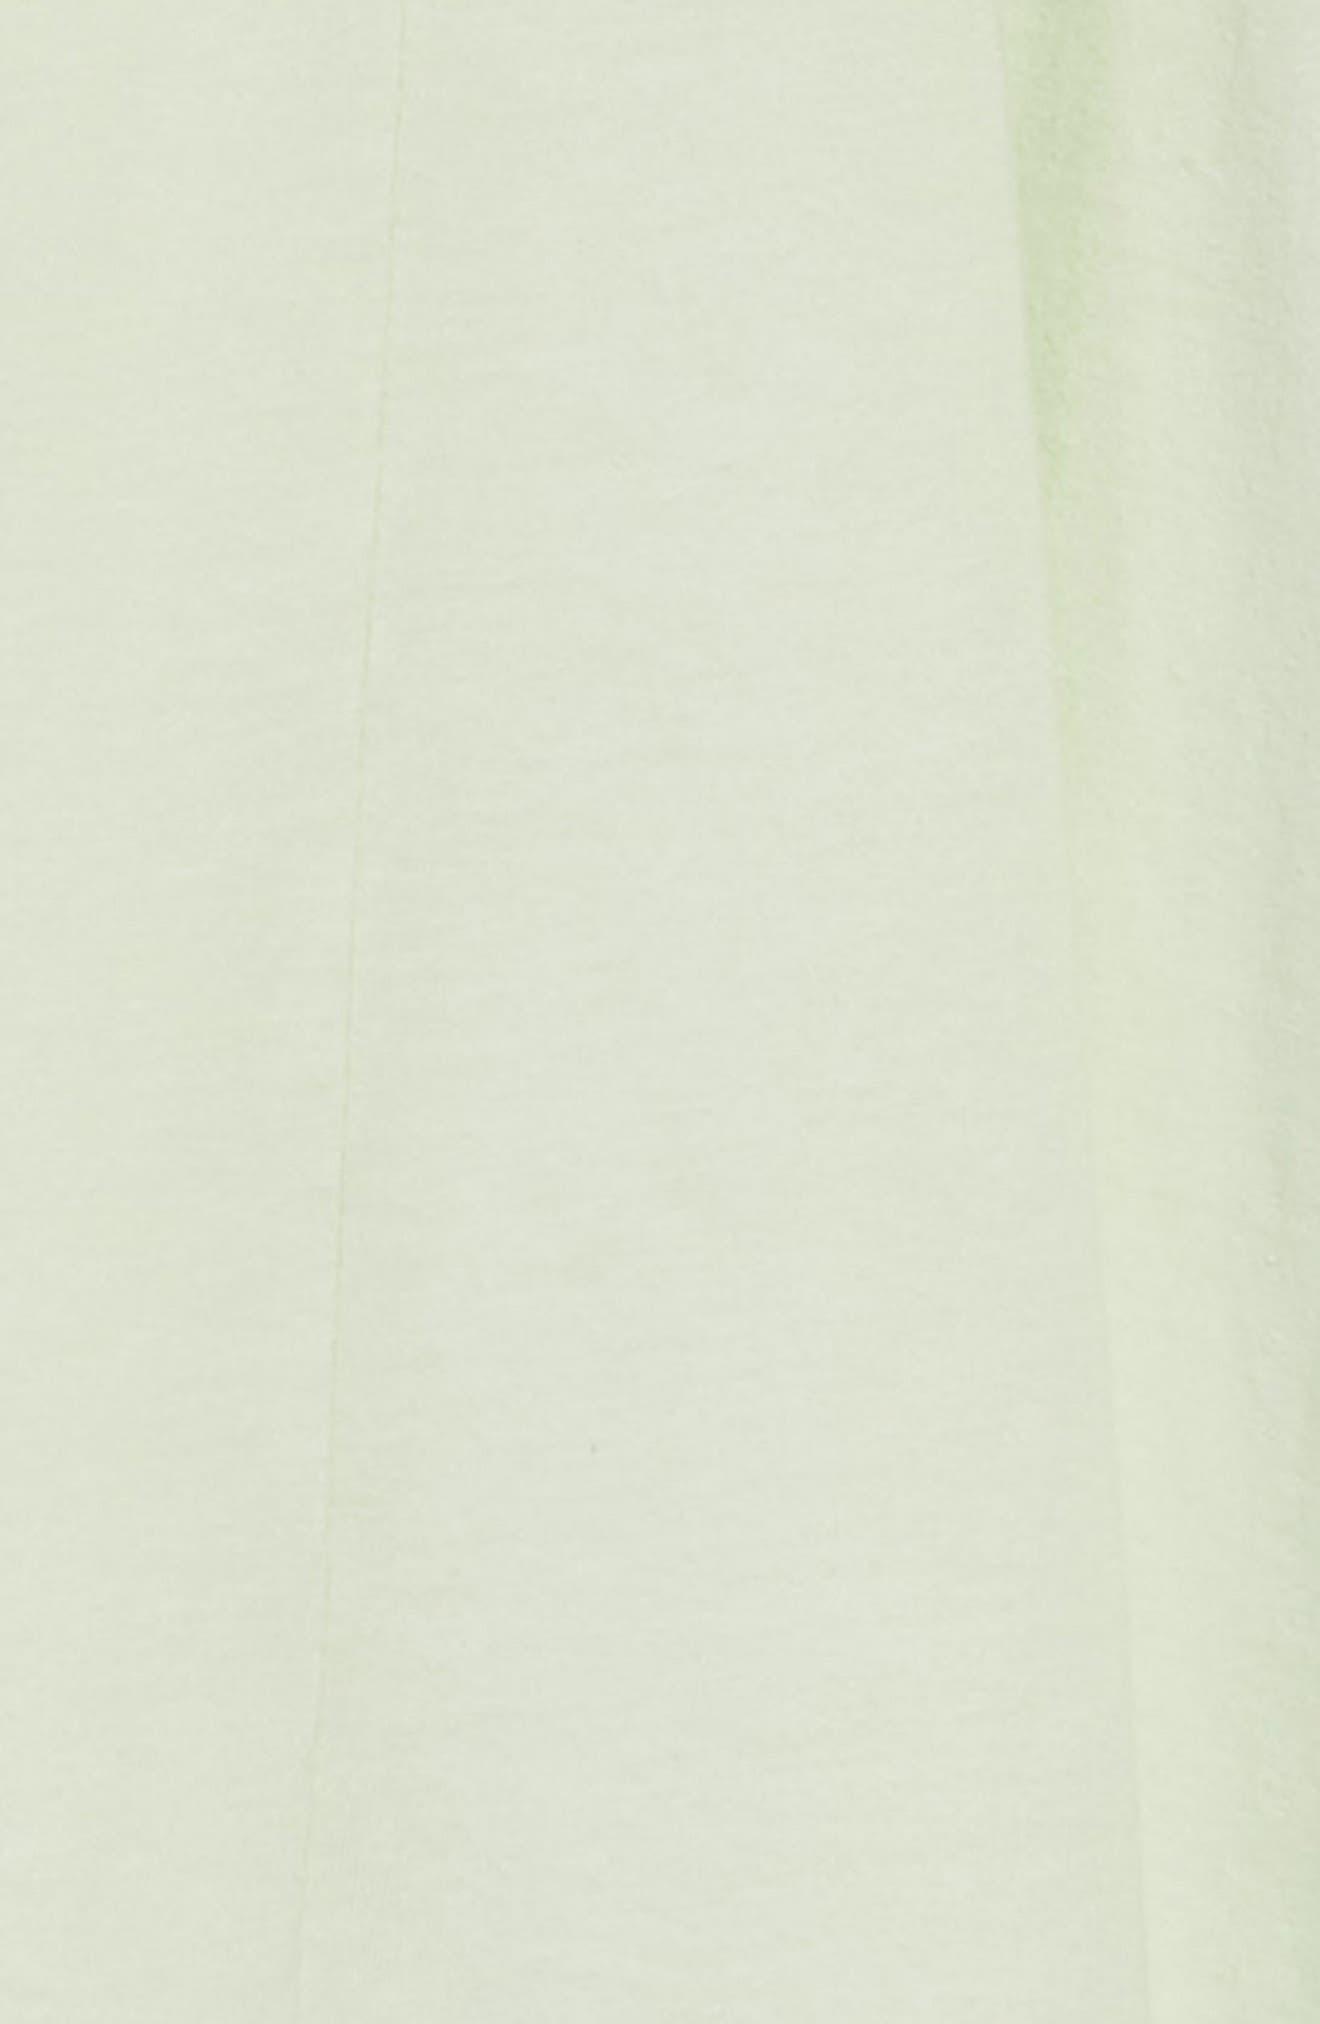 Cold Shoulder Swing Dress,                             Alternate thumbnail 3, color,                             Green